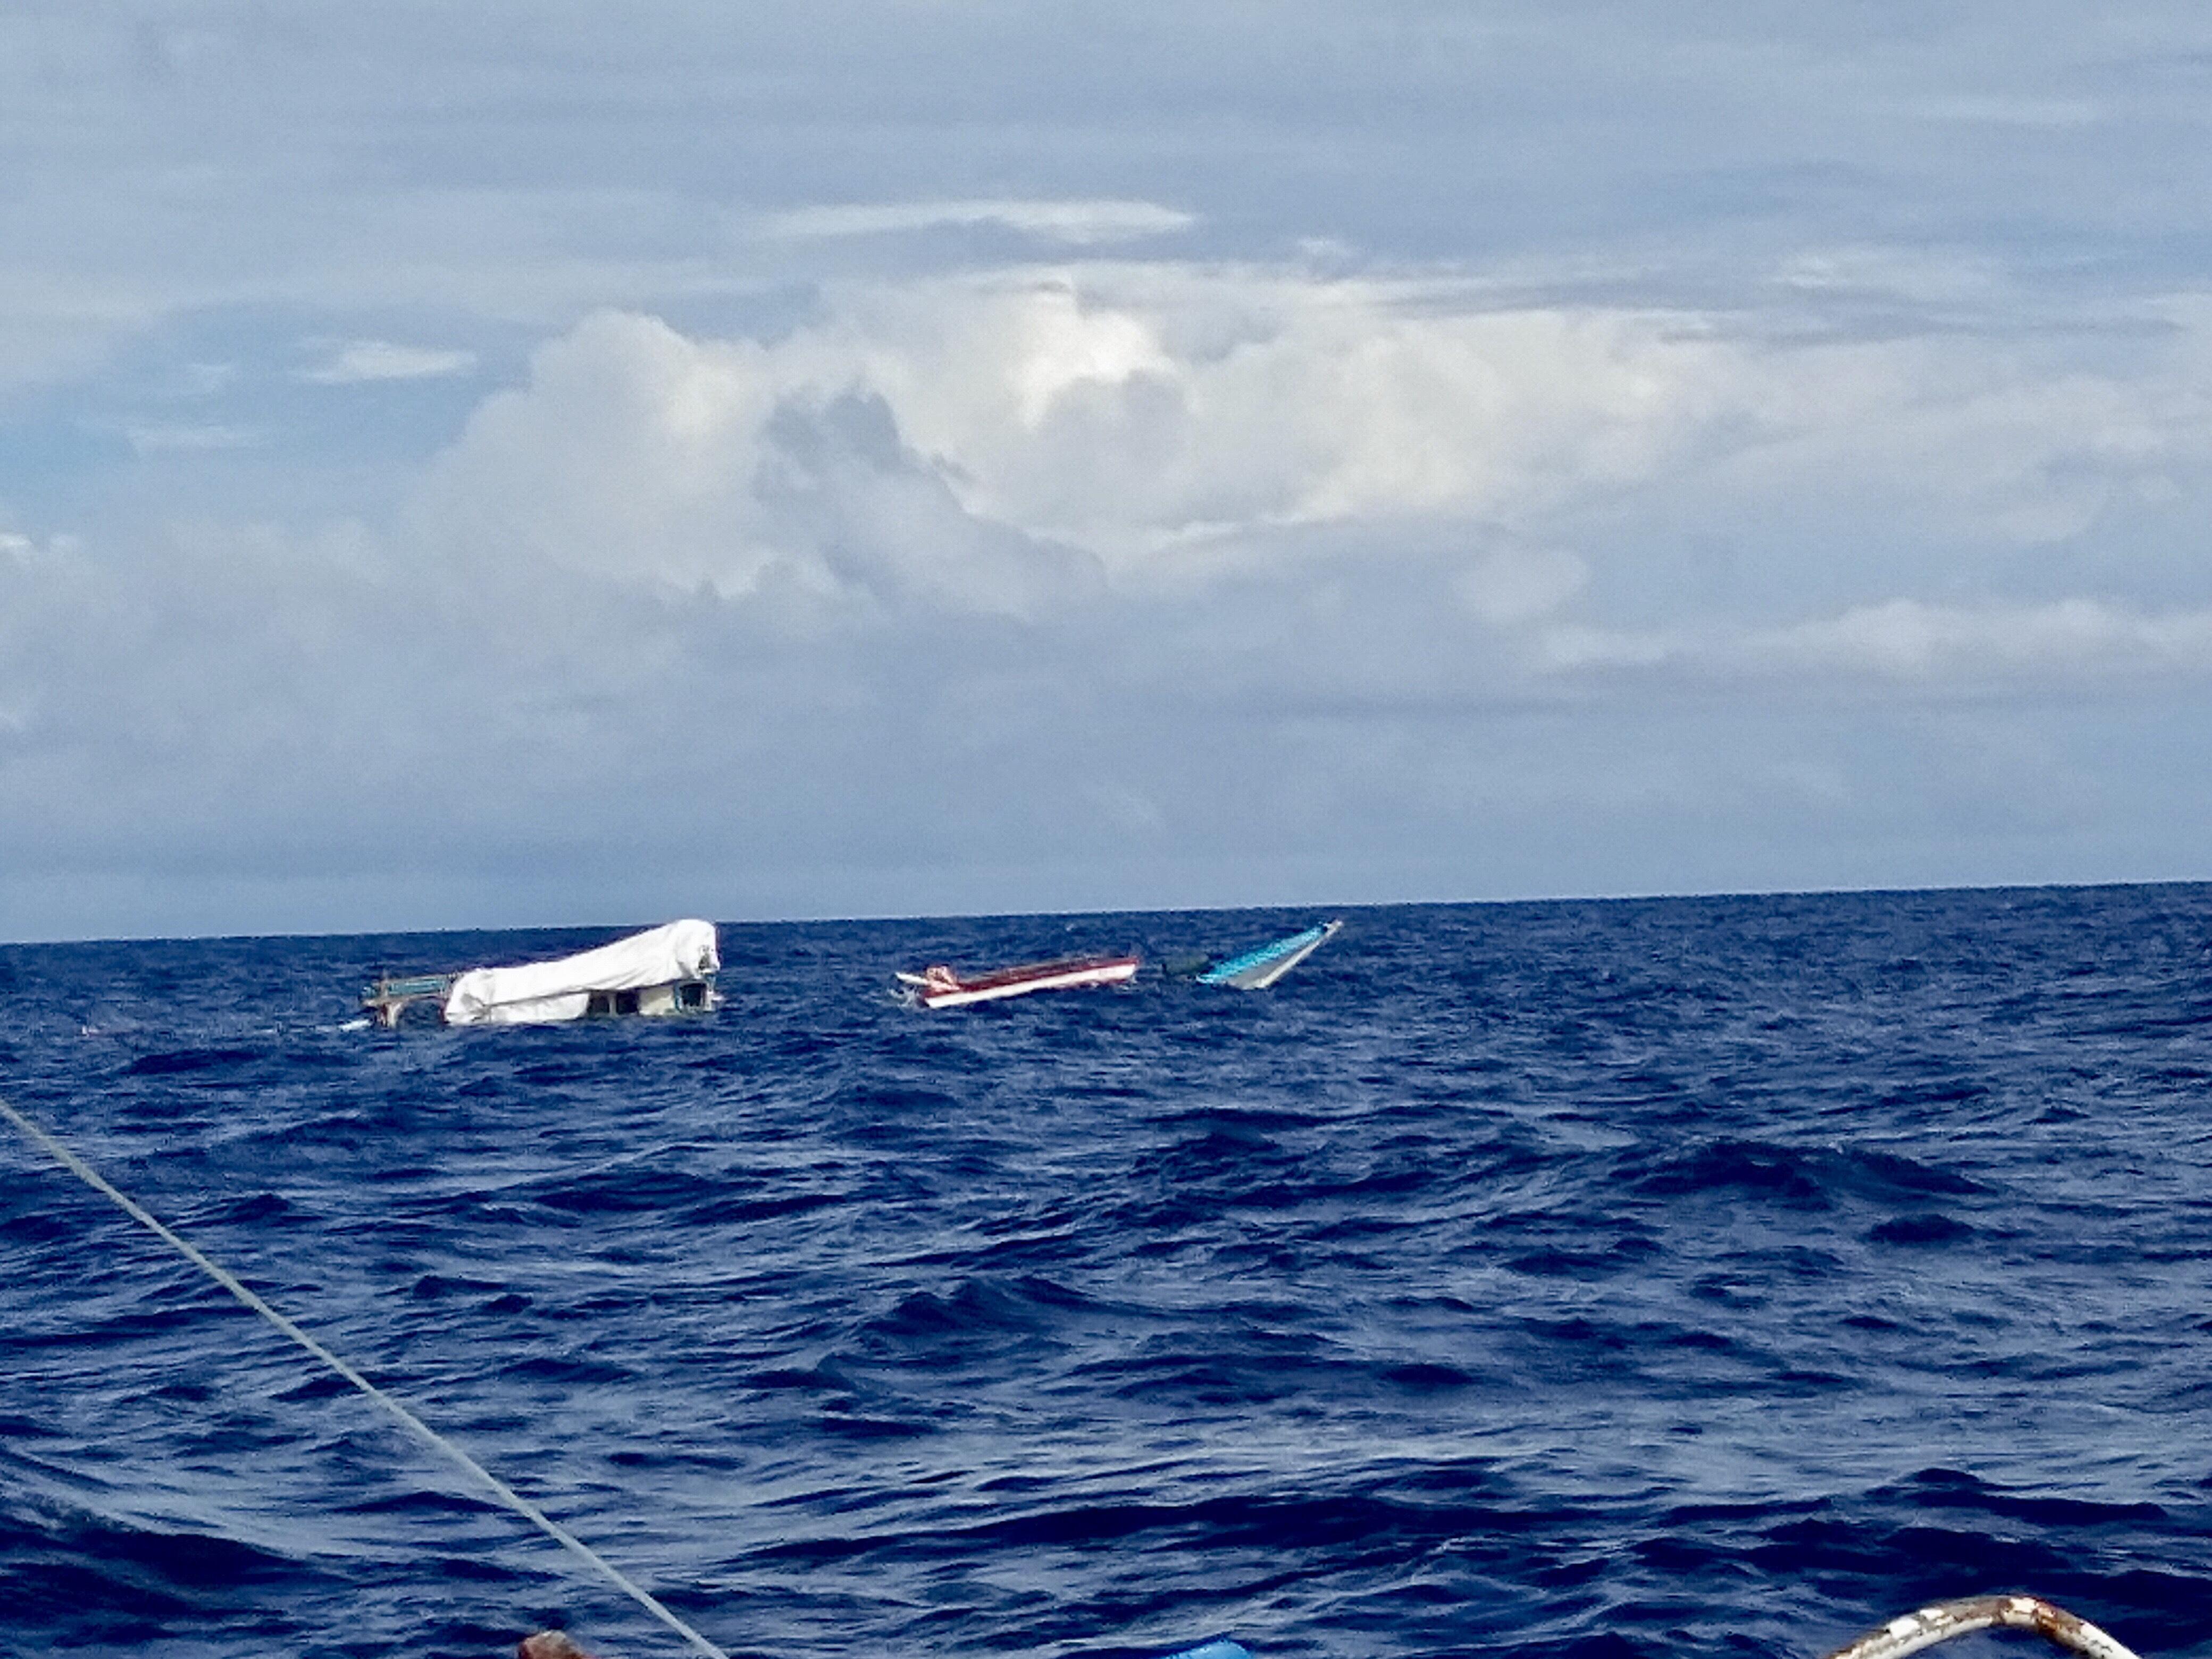 SUNKEN. Fishing Boat Gem-Vir in the West Philippine Sea. Sourced photo